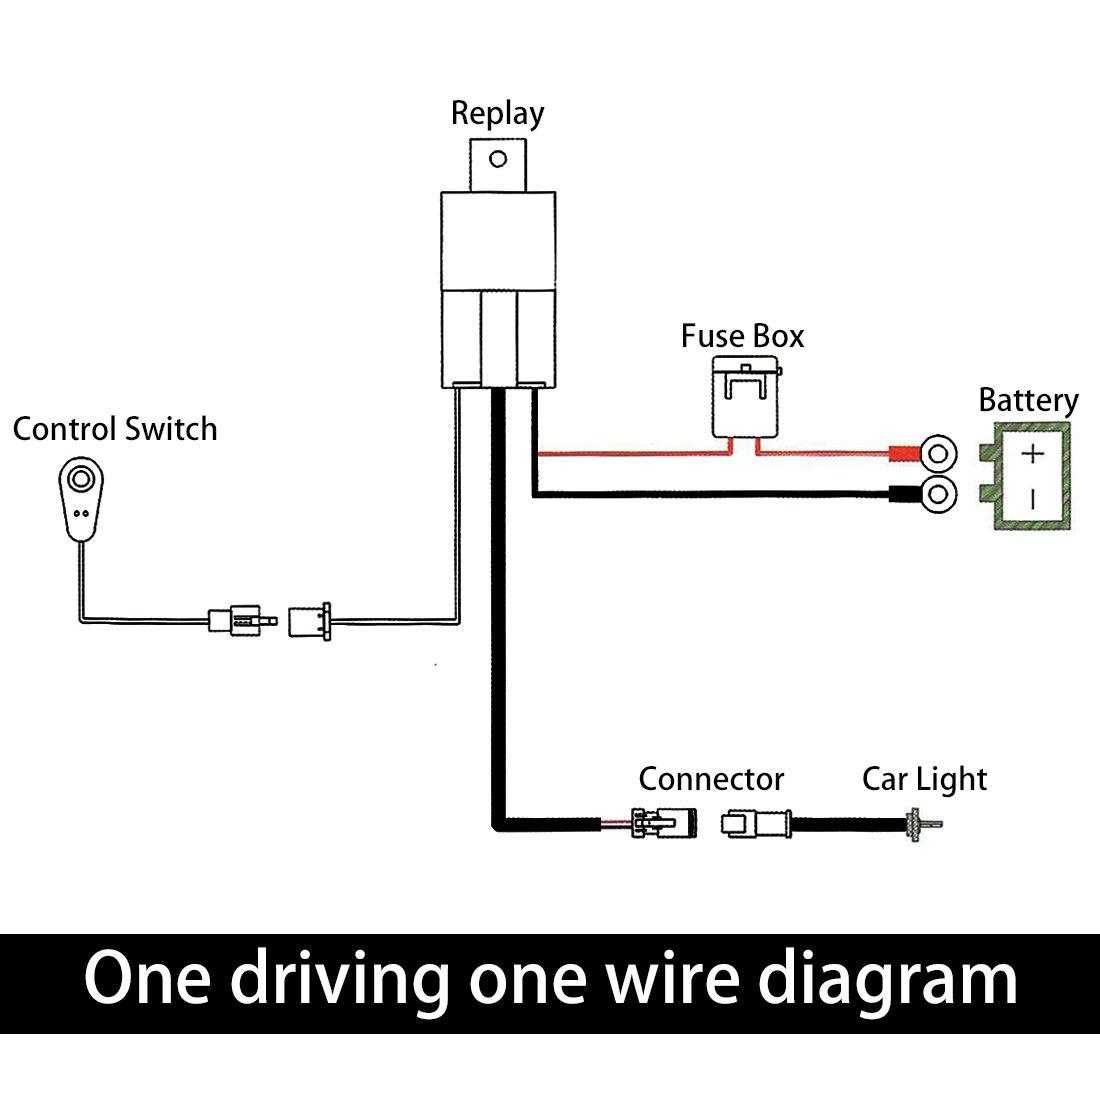 amazon com uxcell 10ft 40a 12v led work fog light bar wiring rh amazon com Wiring 120V LED Lights Wiring-Diagram Wiring 120V LED Lights Wiring-Diagram